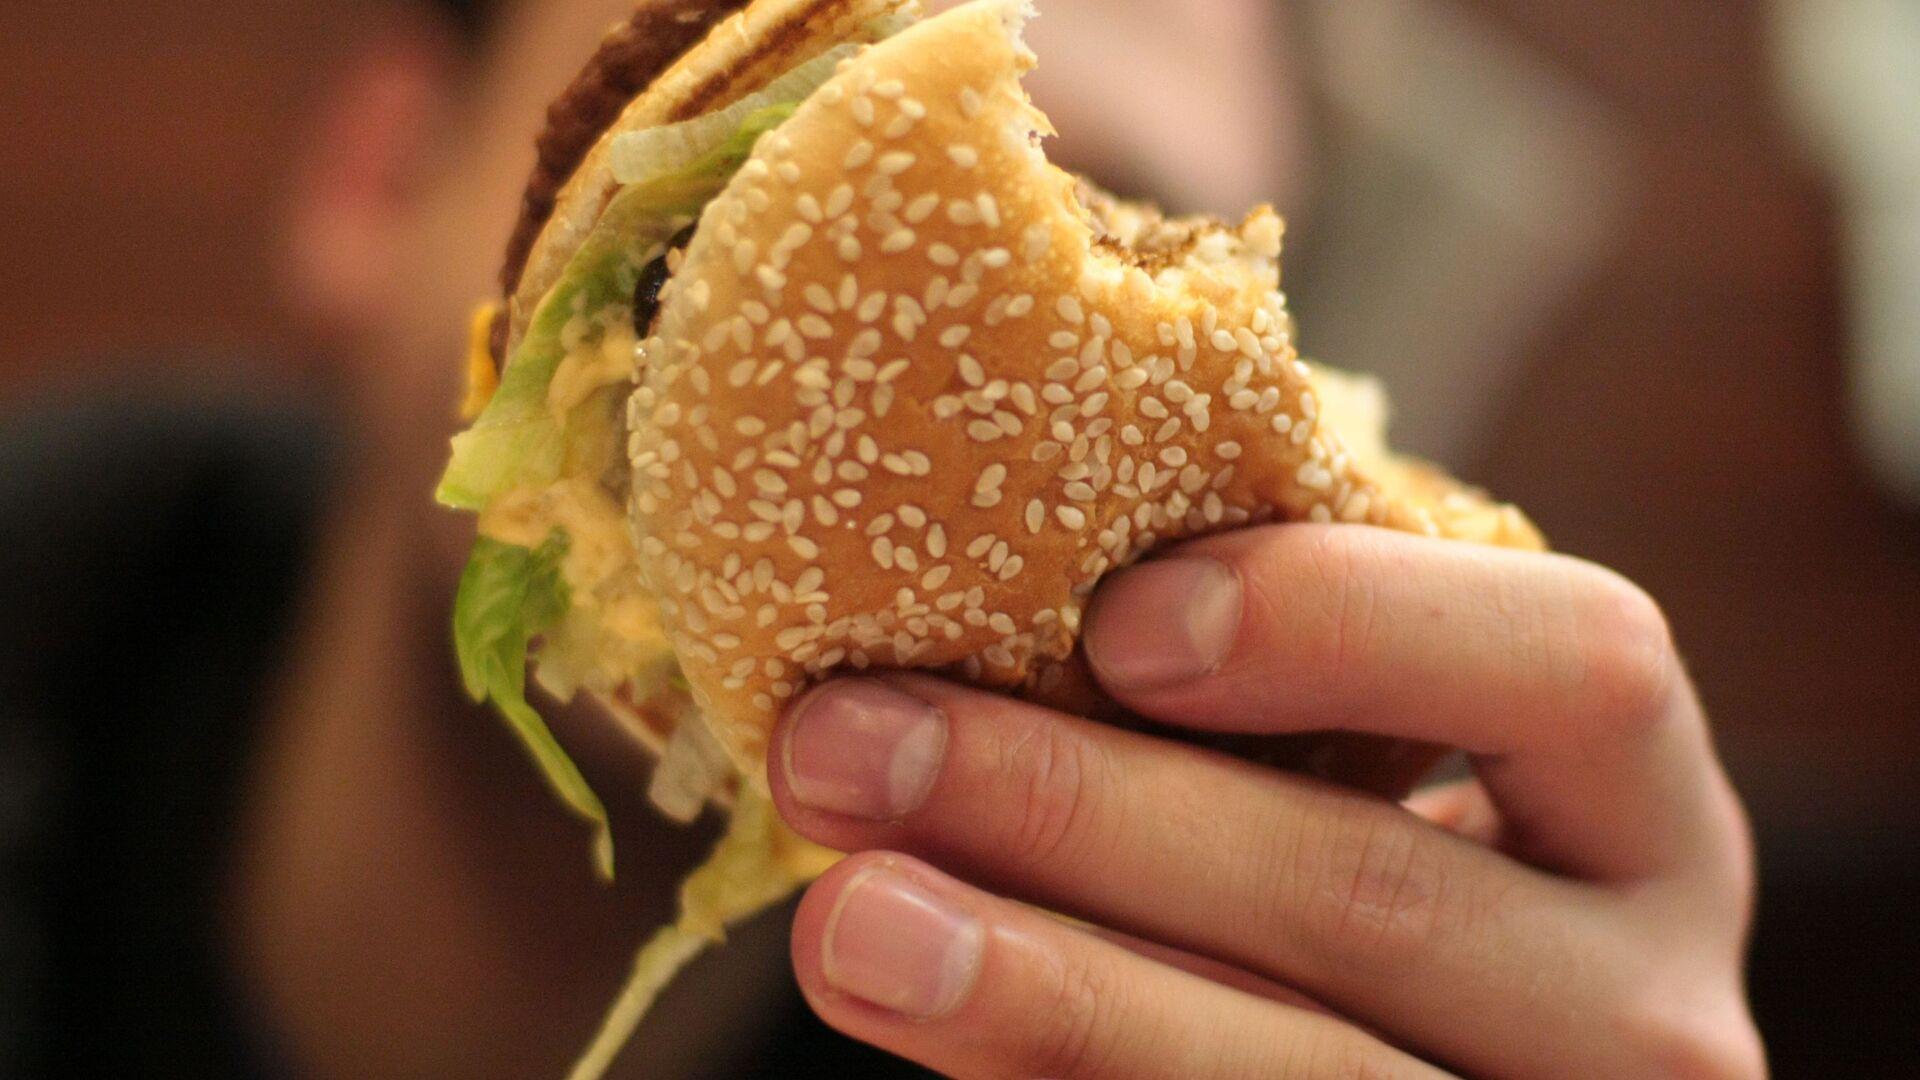 Hamburger z baru szybkiej obsługi sieci McDonald's - Sputnik Polska, 1920, 05.08.2021